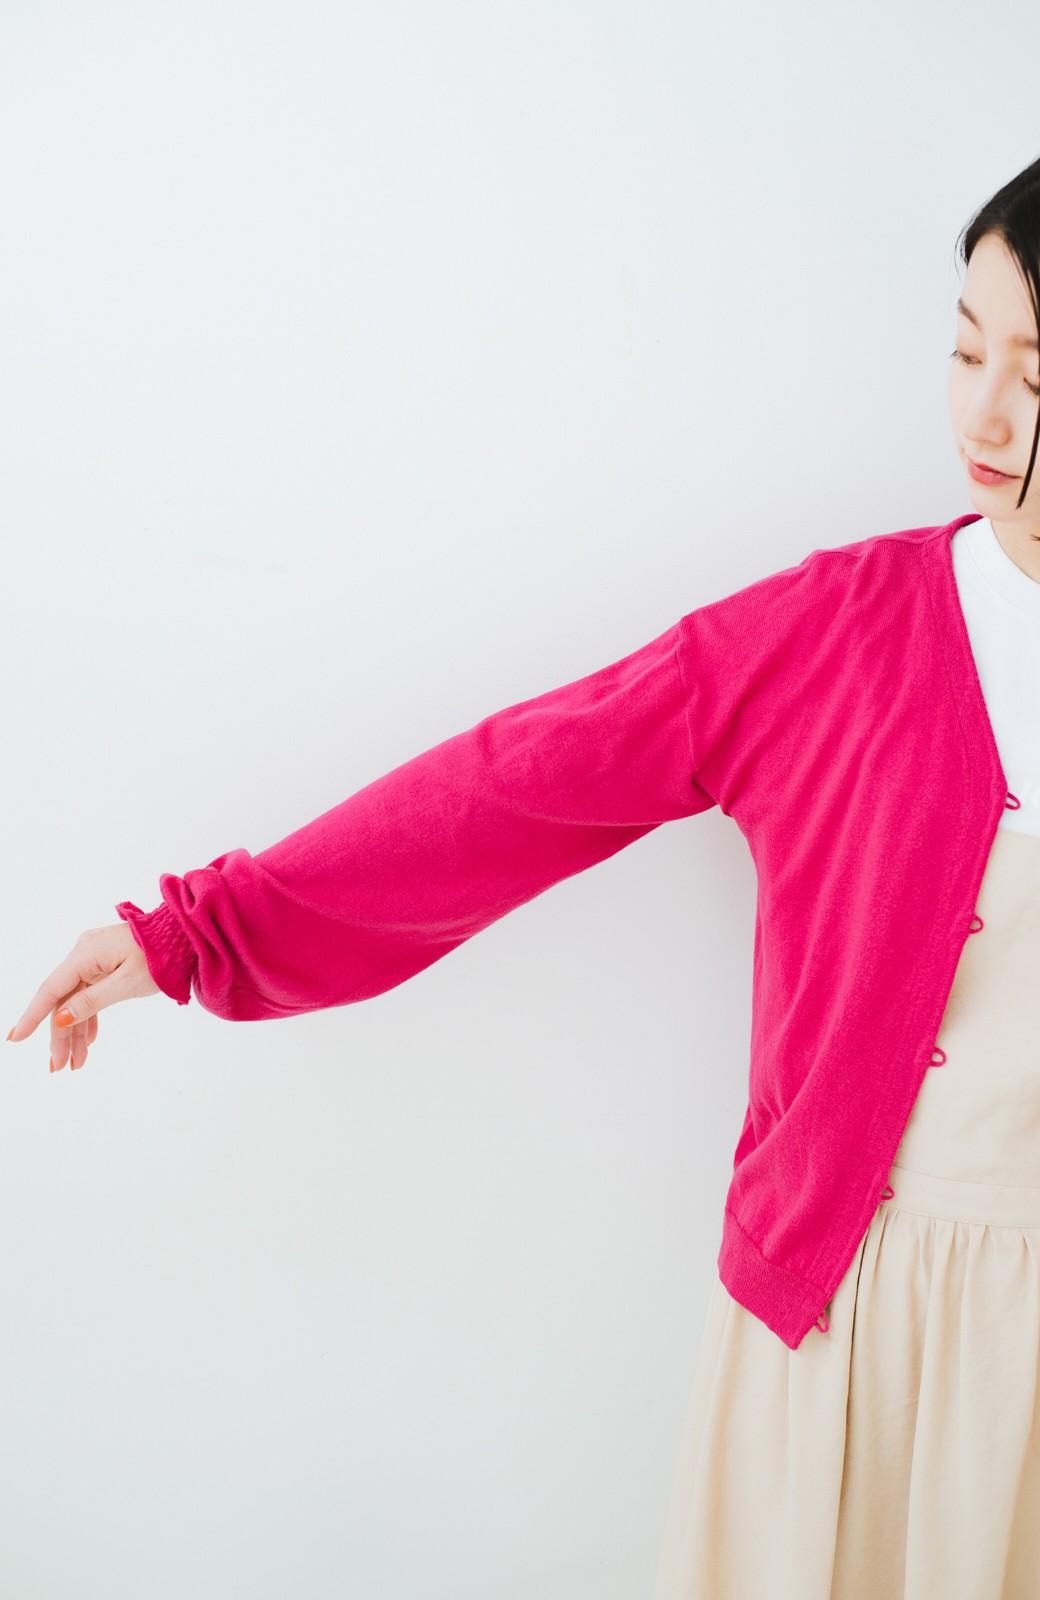 haco! 我らが天敵紫外線!UVカット加工の袖シャーリングニットカーディガン <ピンク>の商品写真14